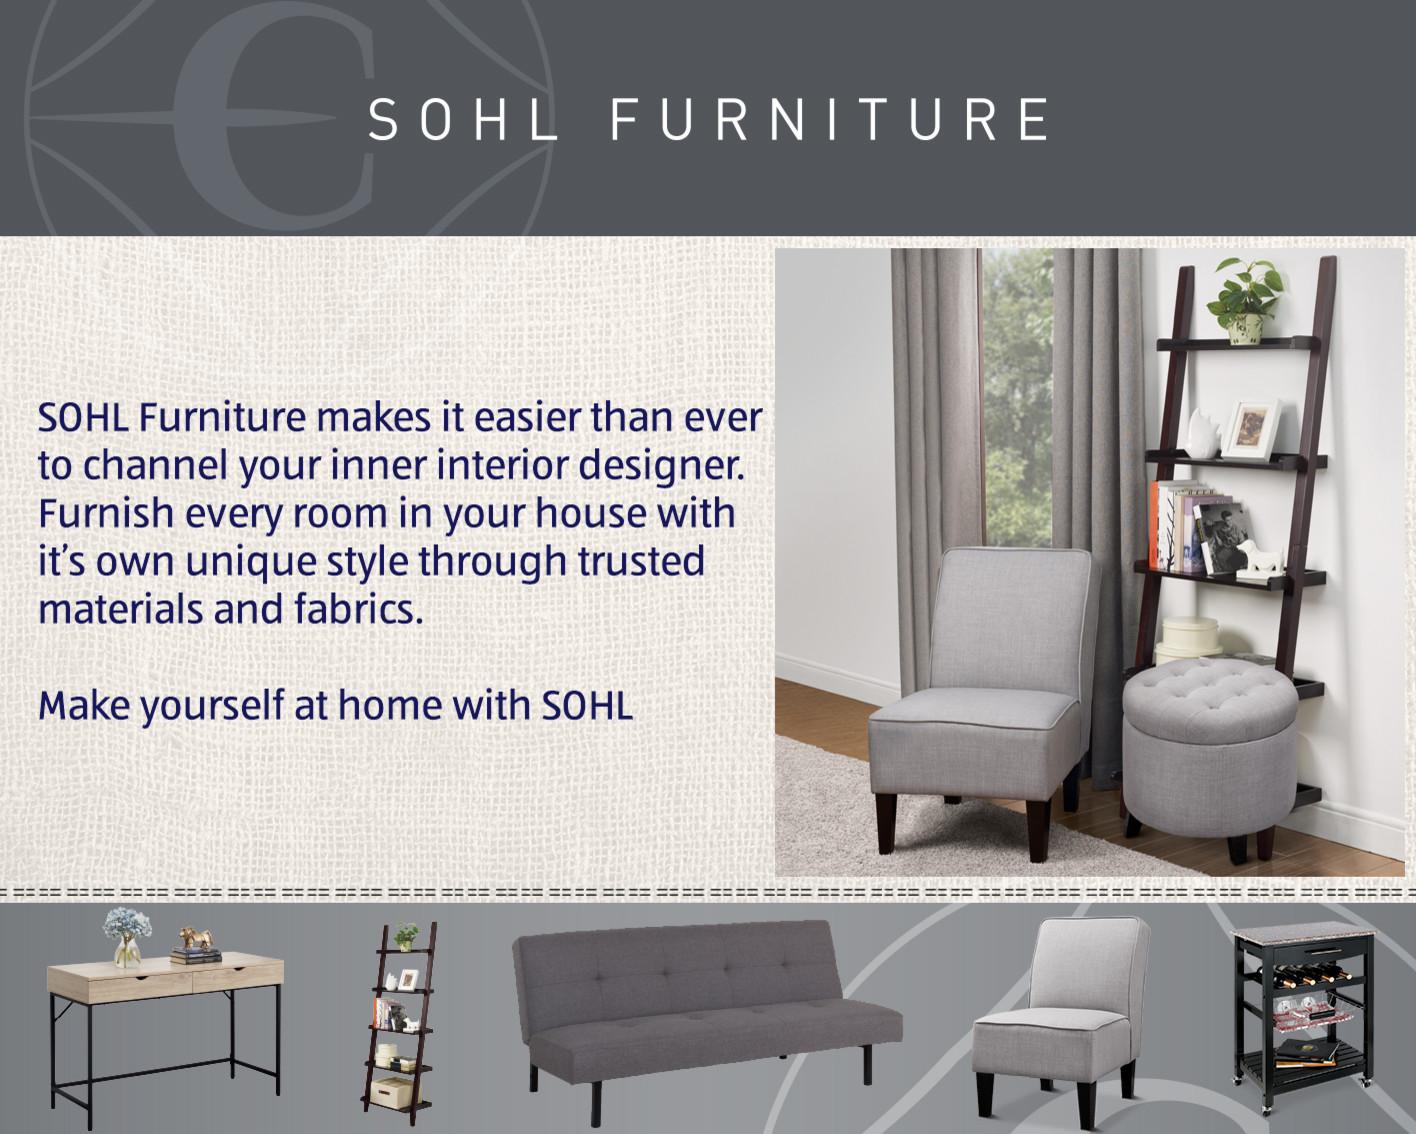 Sohl Furniture Affordable Goods For